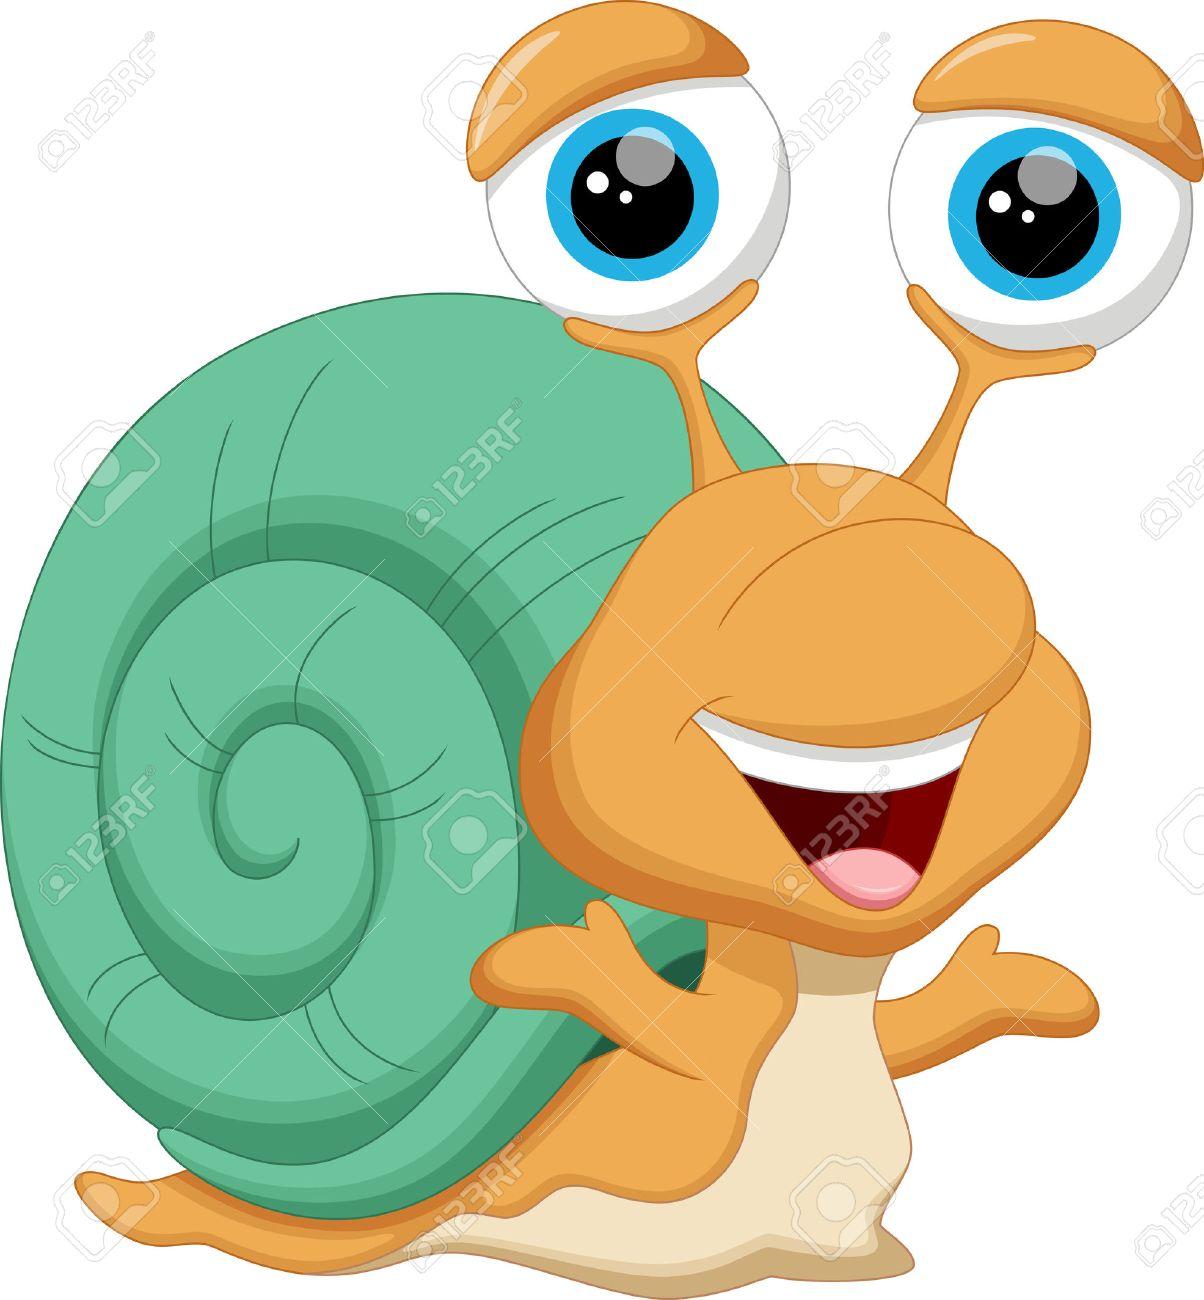 Cute baby snail cartoon - 43828967